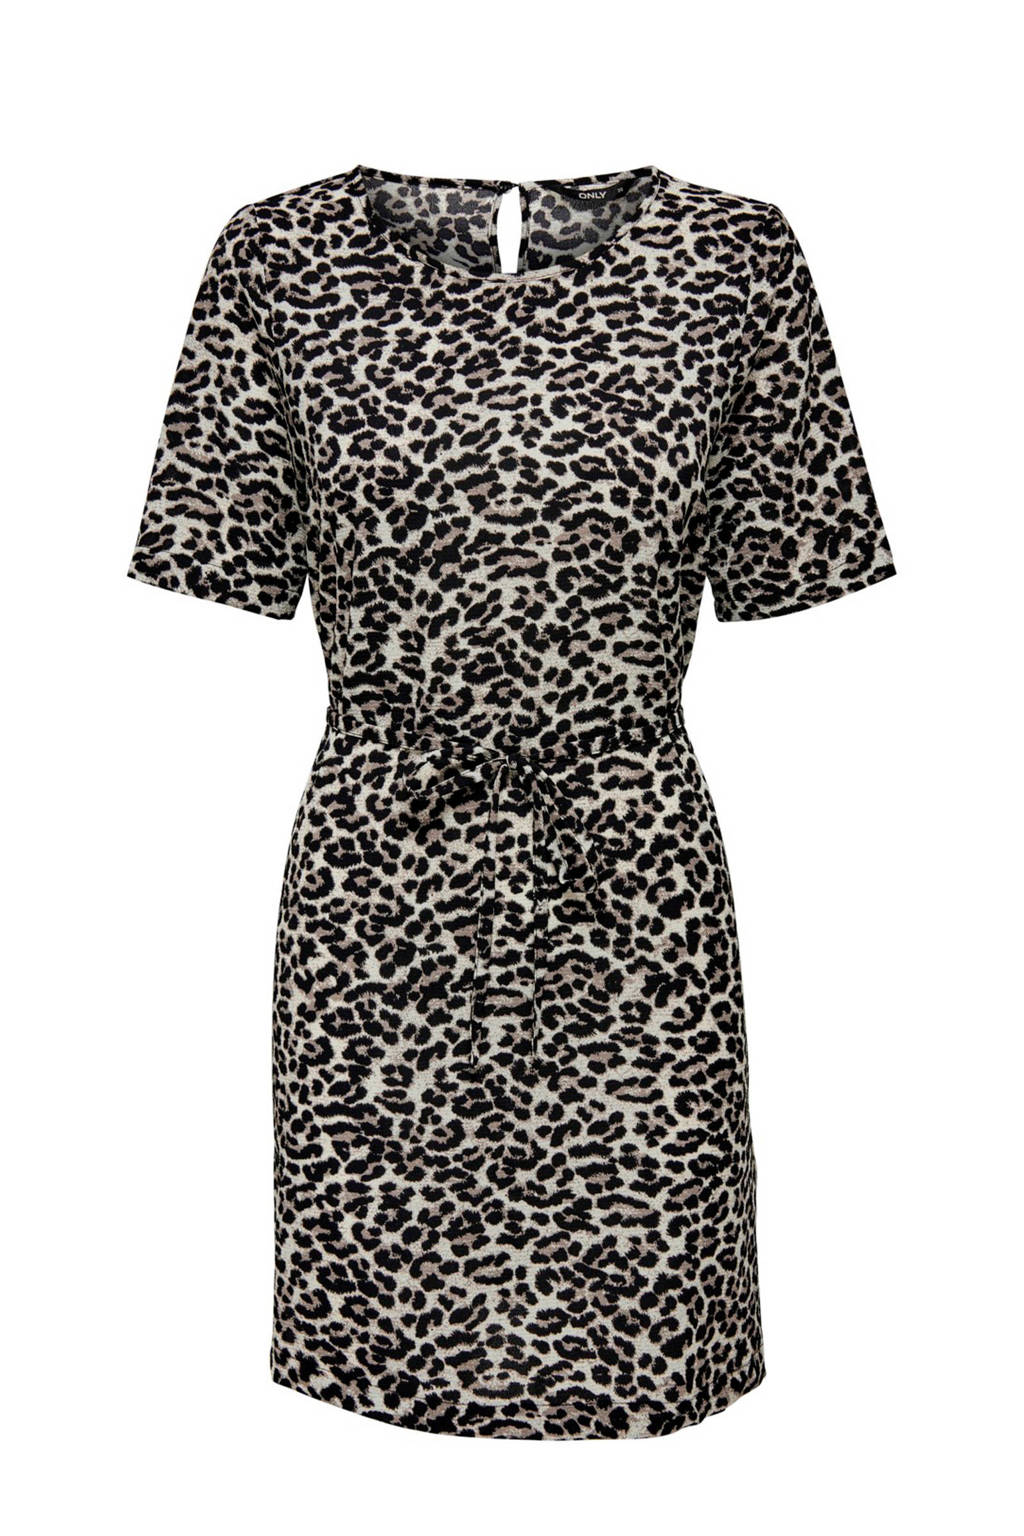 ONLY jurk met panterprint ecru, Ecru/zwart